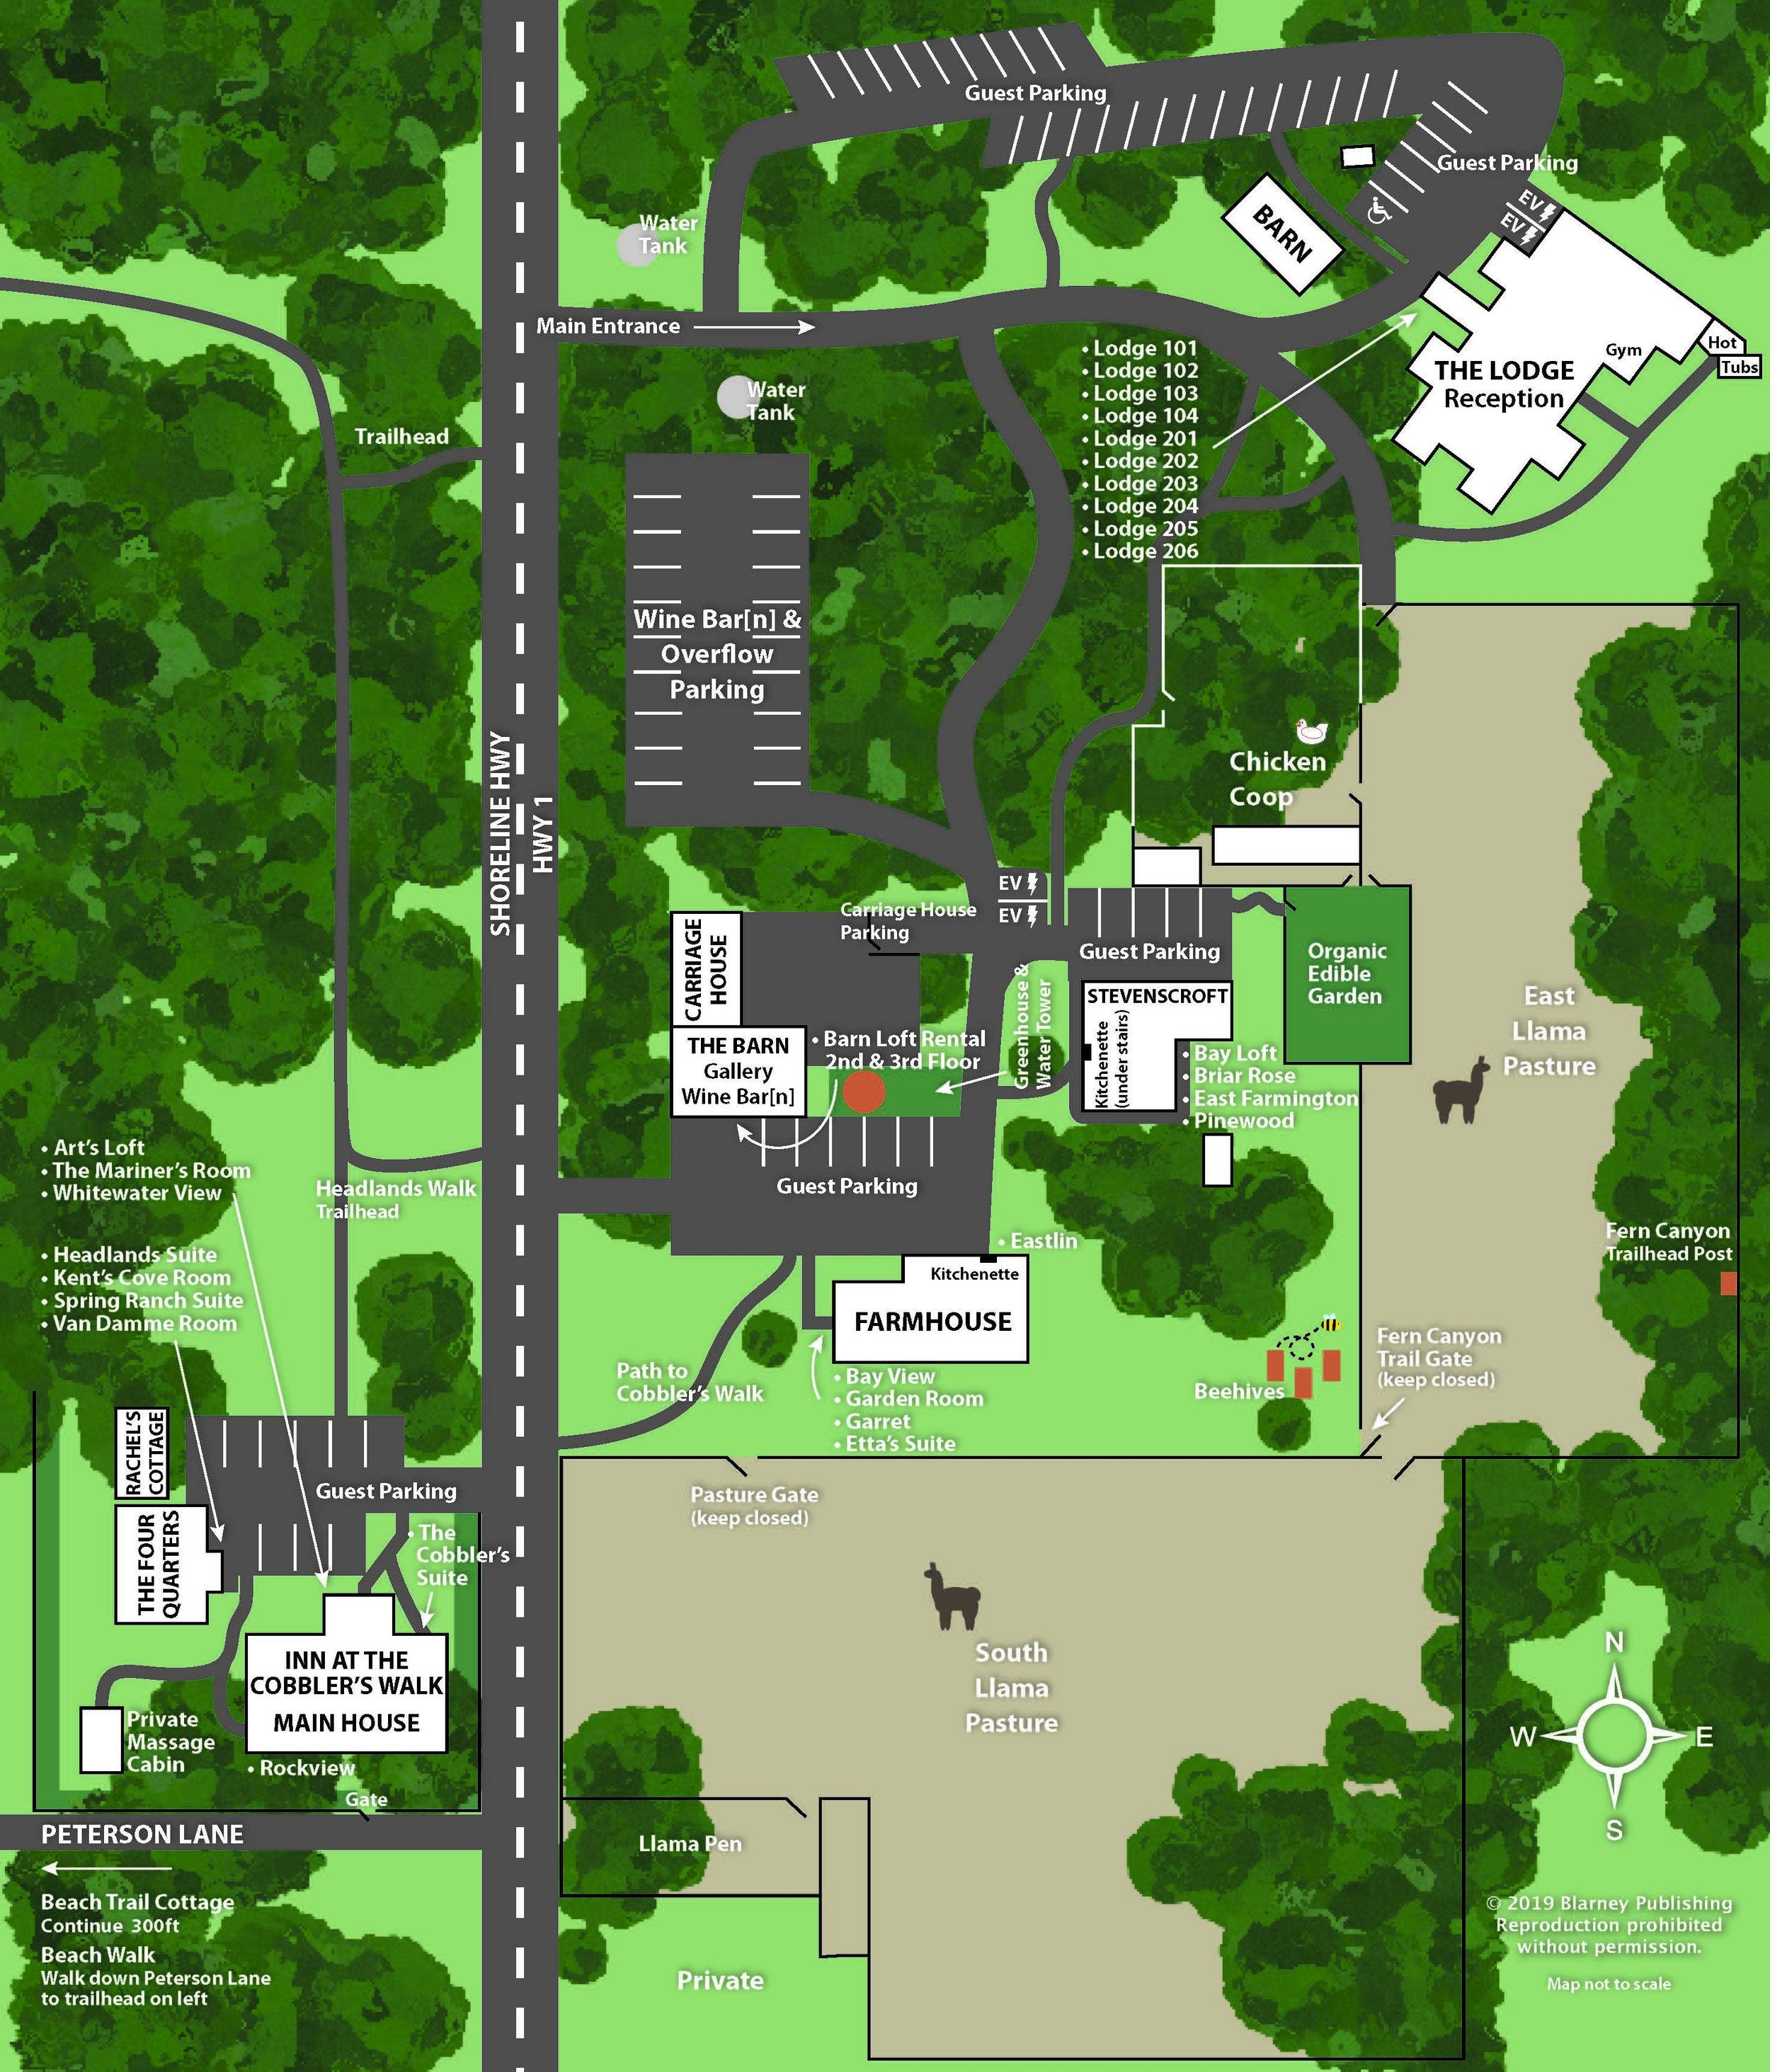 Property map of Glendeven Inn & Lodge and The Inn at Cobbler's Walk